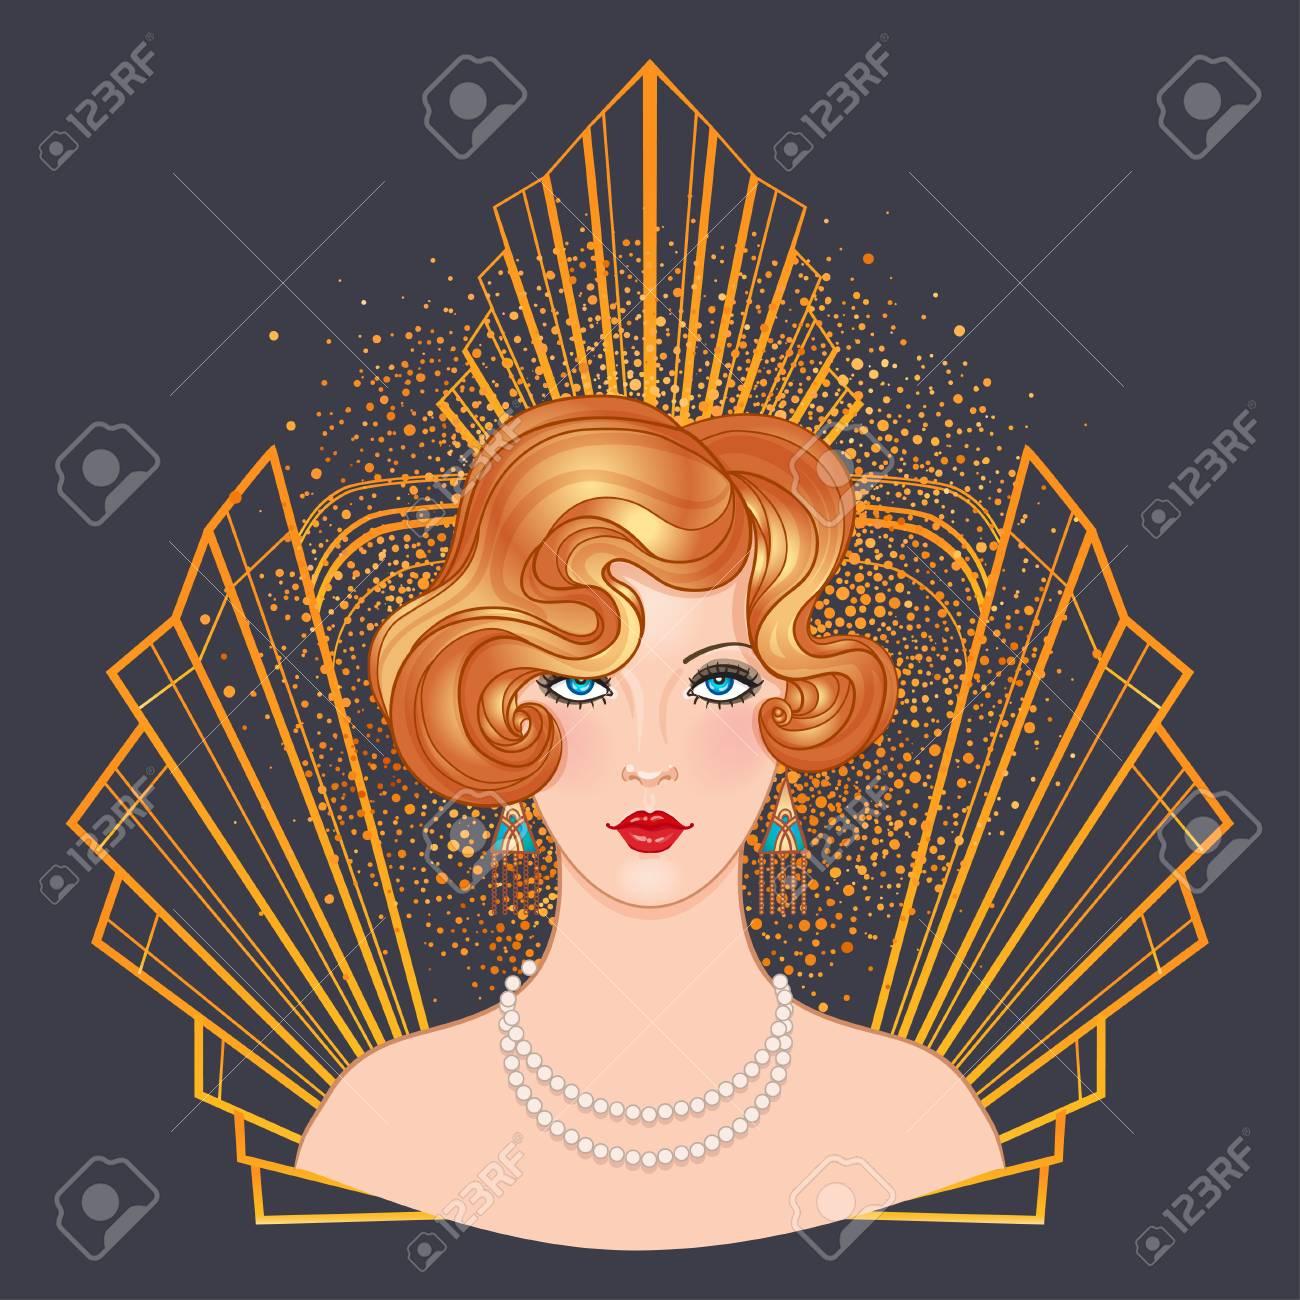 Art Deco Vintage Invitation Template Design With Illustration Of Flapper Girl Patterns And Frames: 1920s Wedding Invitation Clip Art At Reisefeber.org